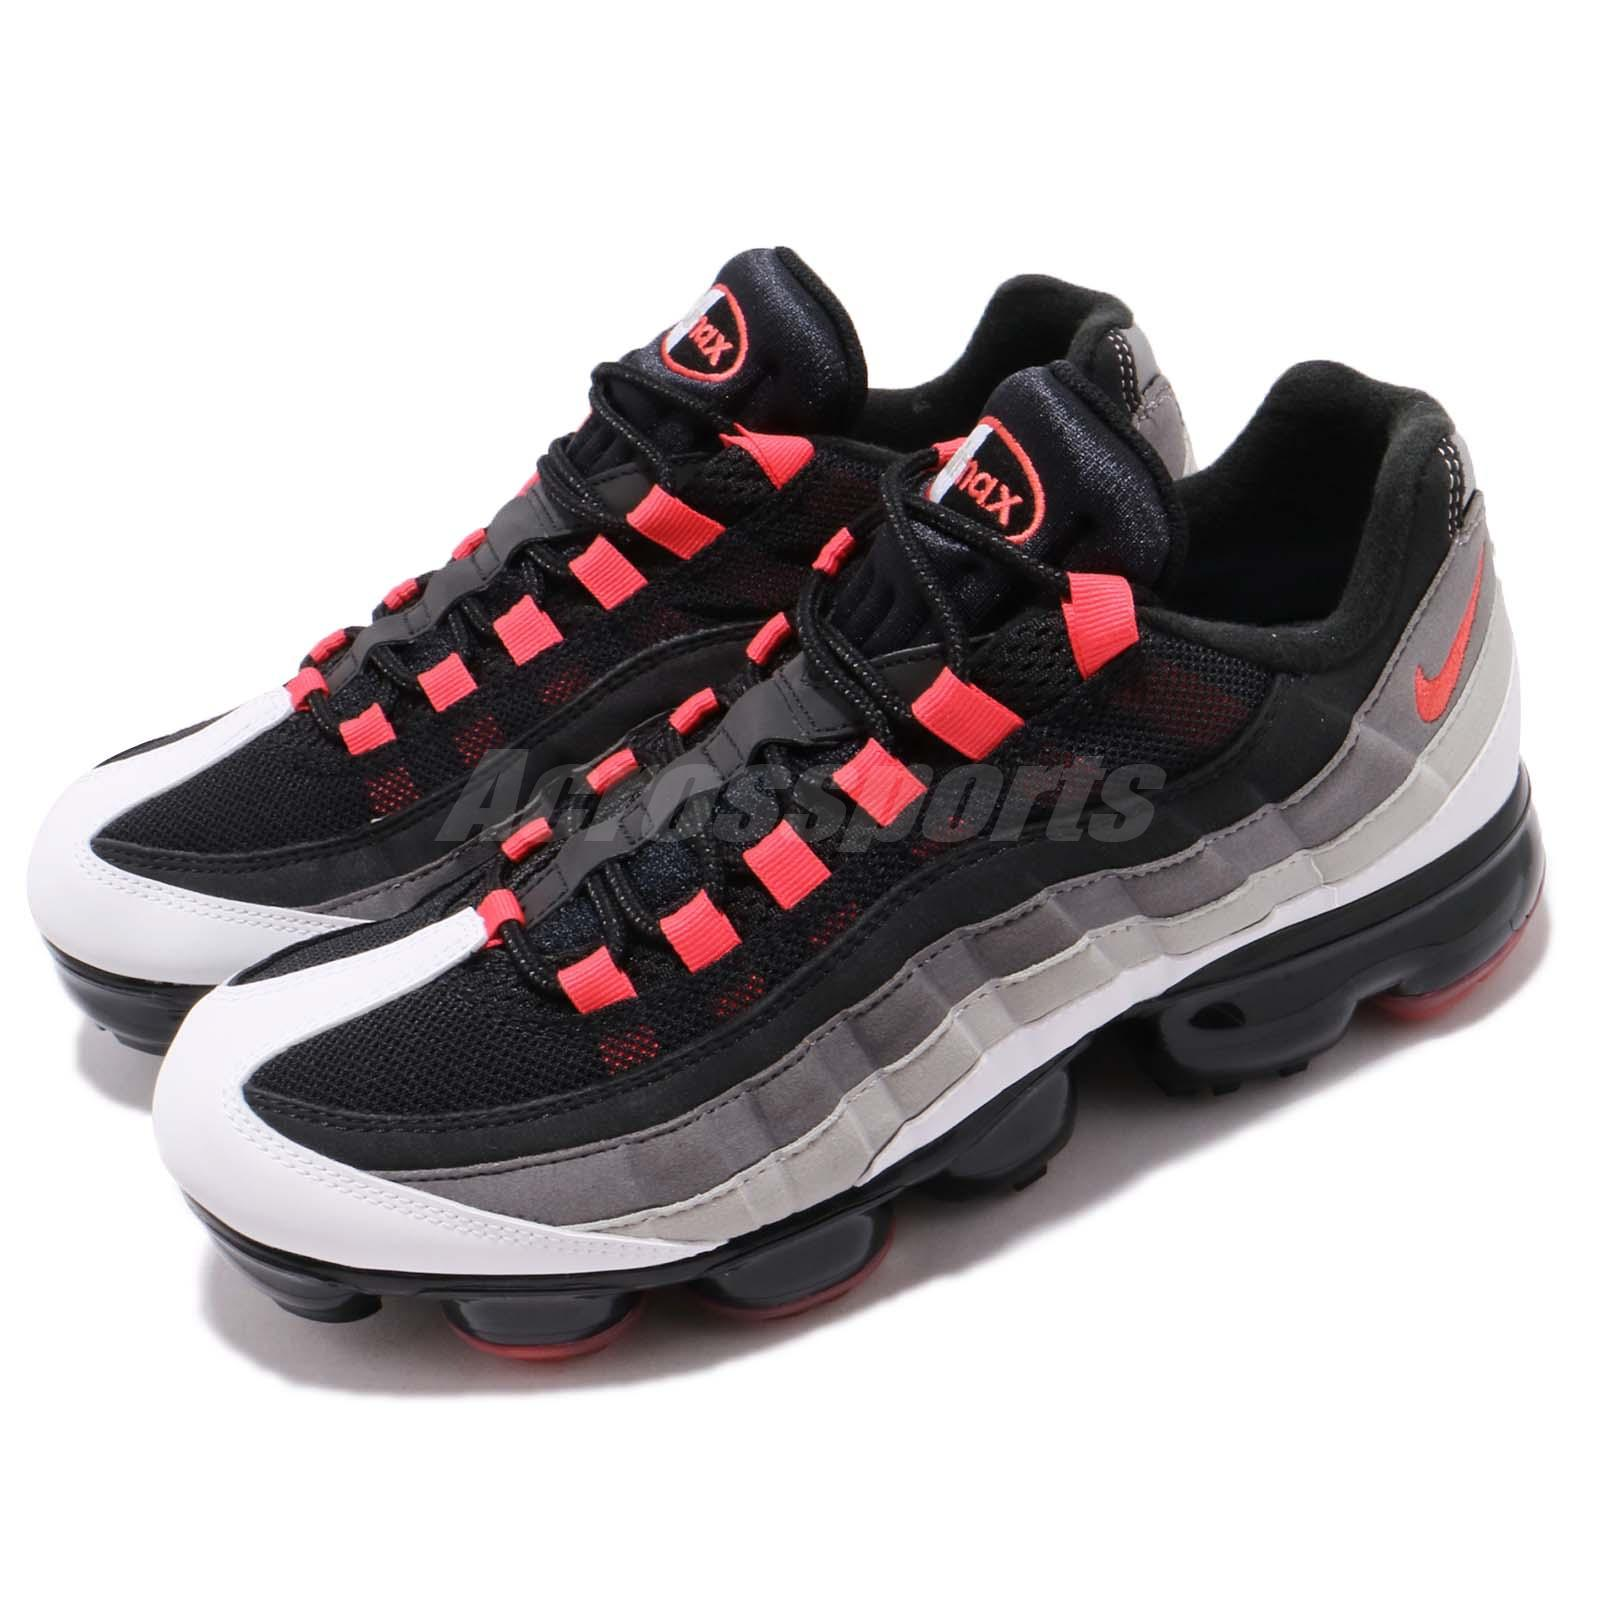 34d767354723 Details about Nike Air Vapormax 95 Hot Red White Dark Pewter Men Running Shoes  AJ7292-101